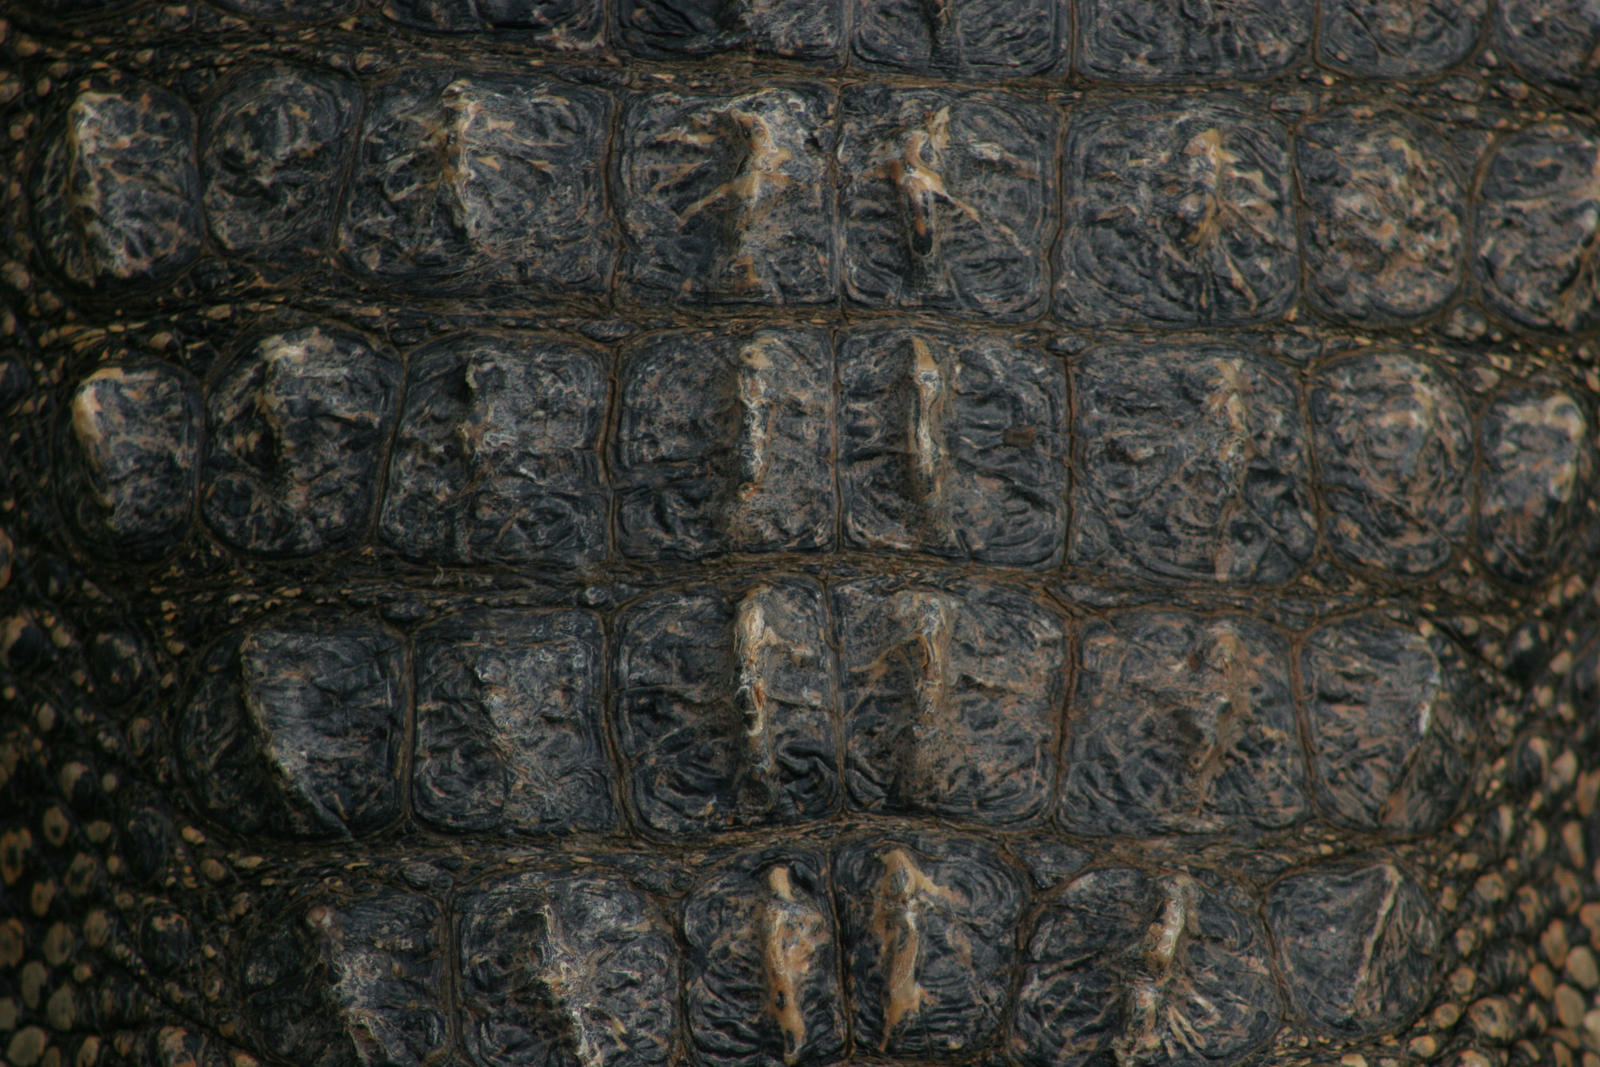 Alligator Neck Texture